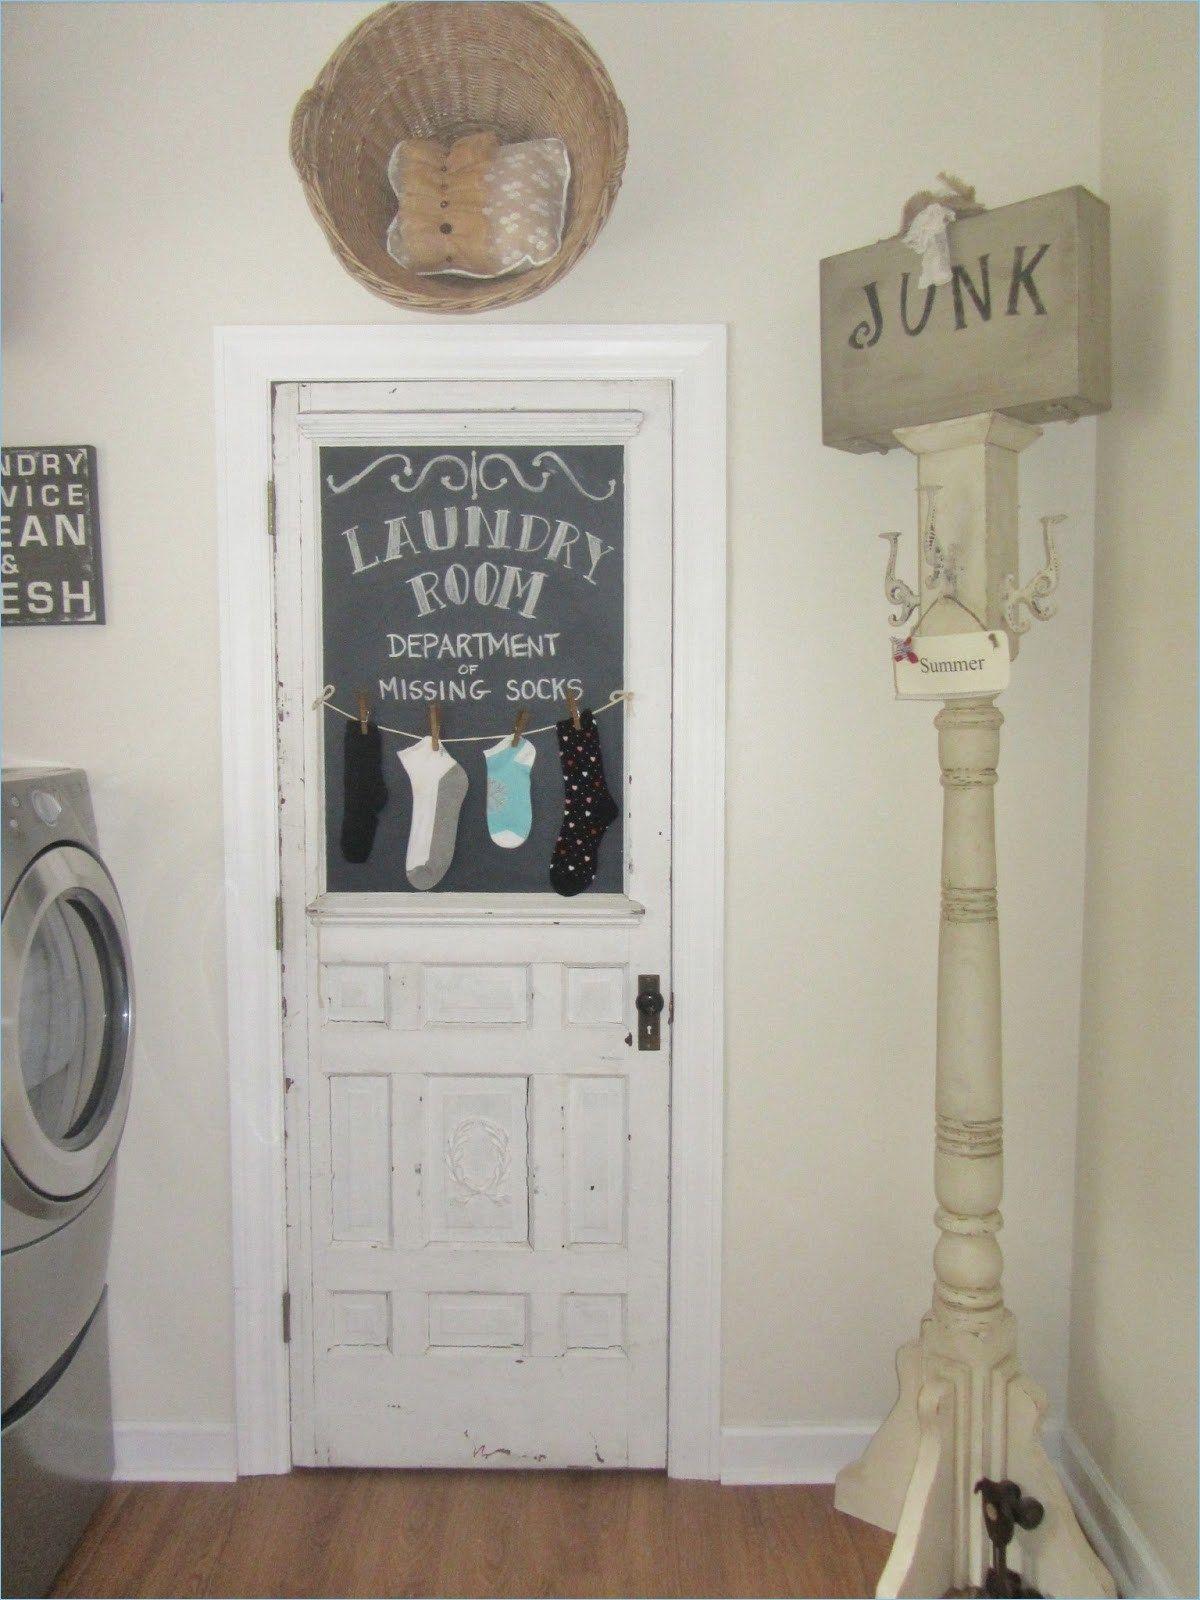 50 Best Inspiring Vintage Cottage Laundry Room Decoration Ideas Junk Chic Cottage Laundry Room Layouts Laundry Room Doors